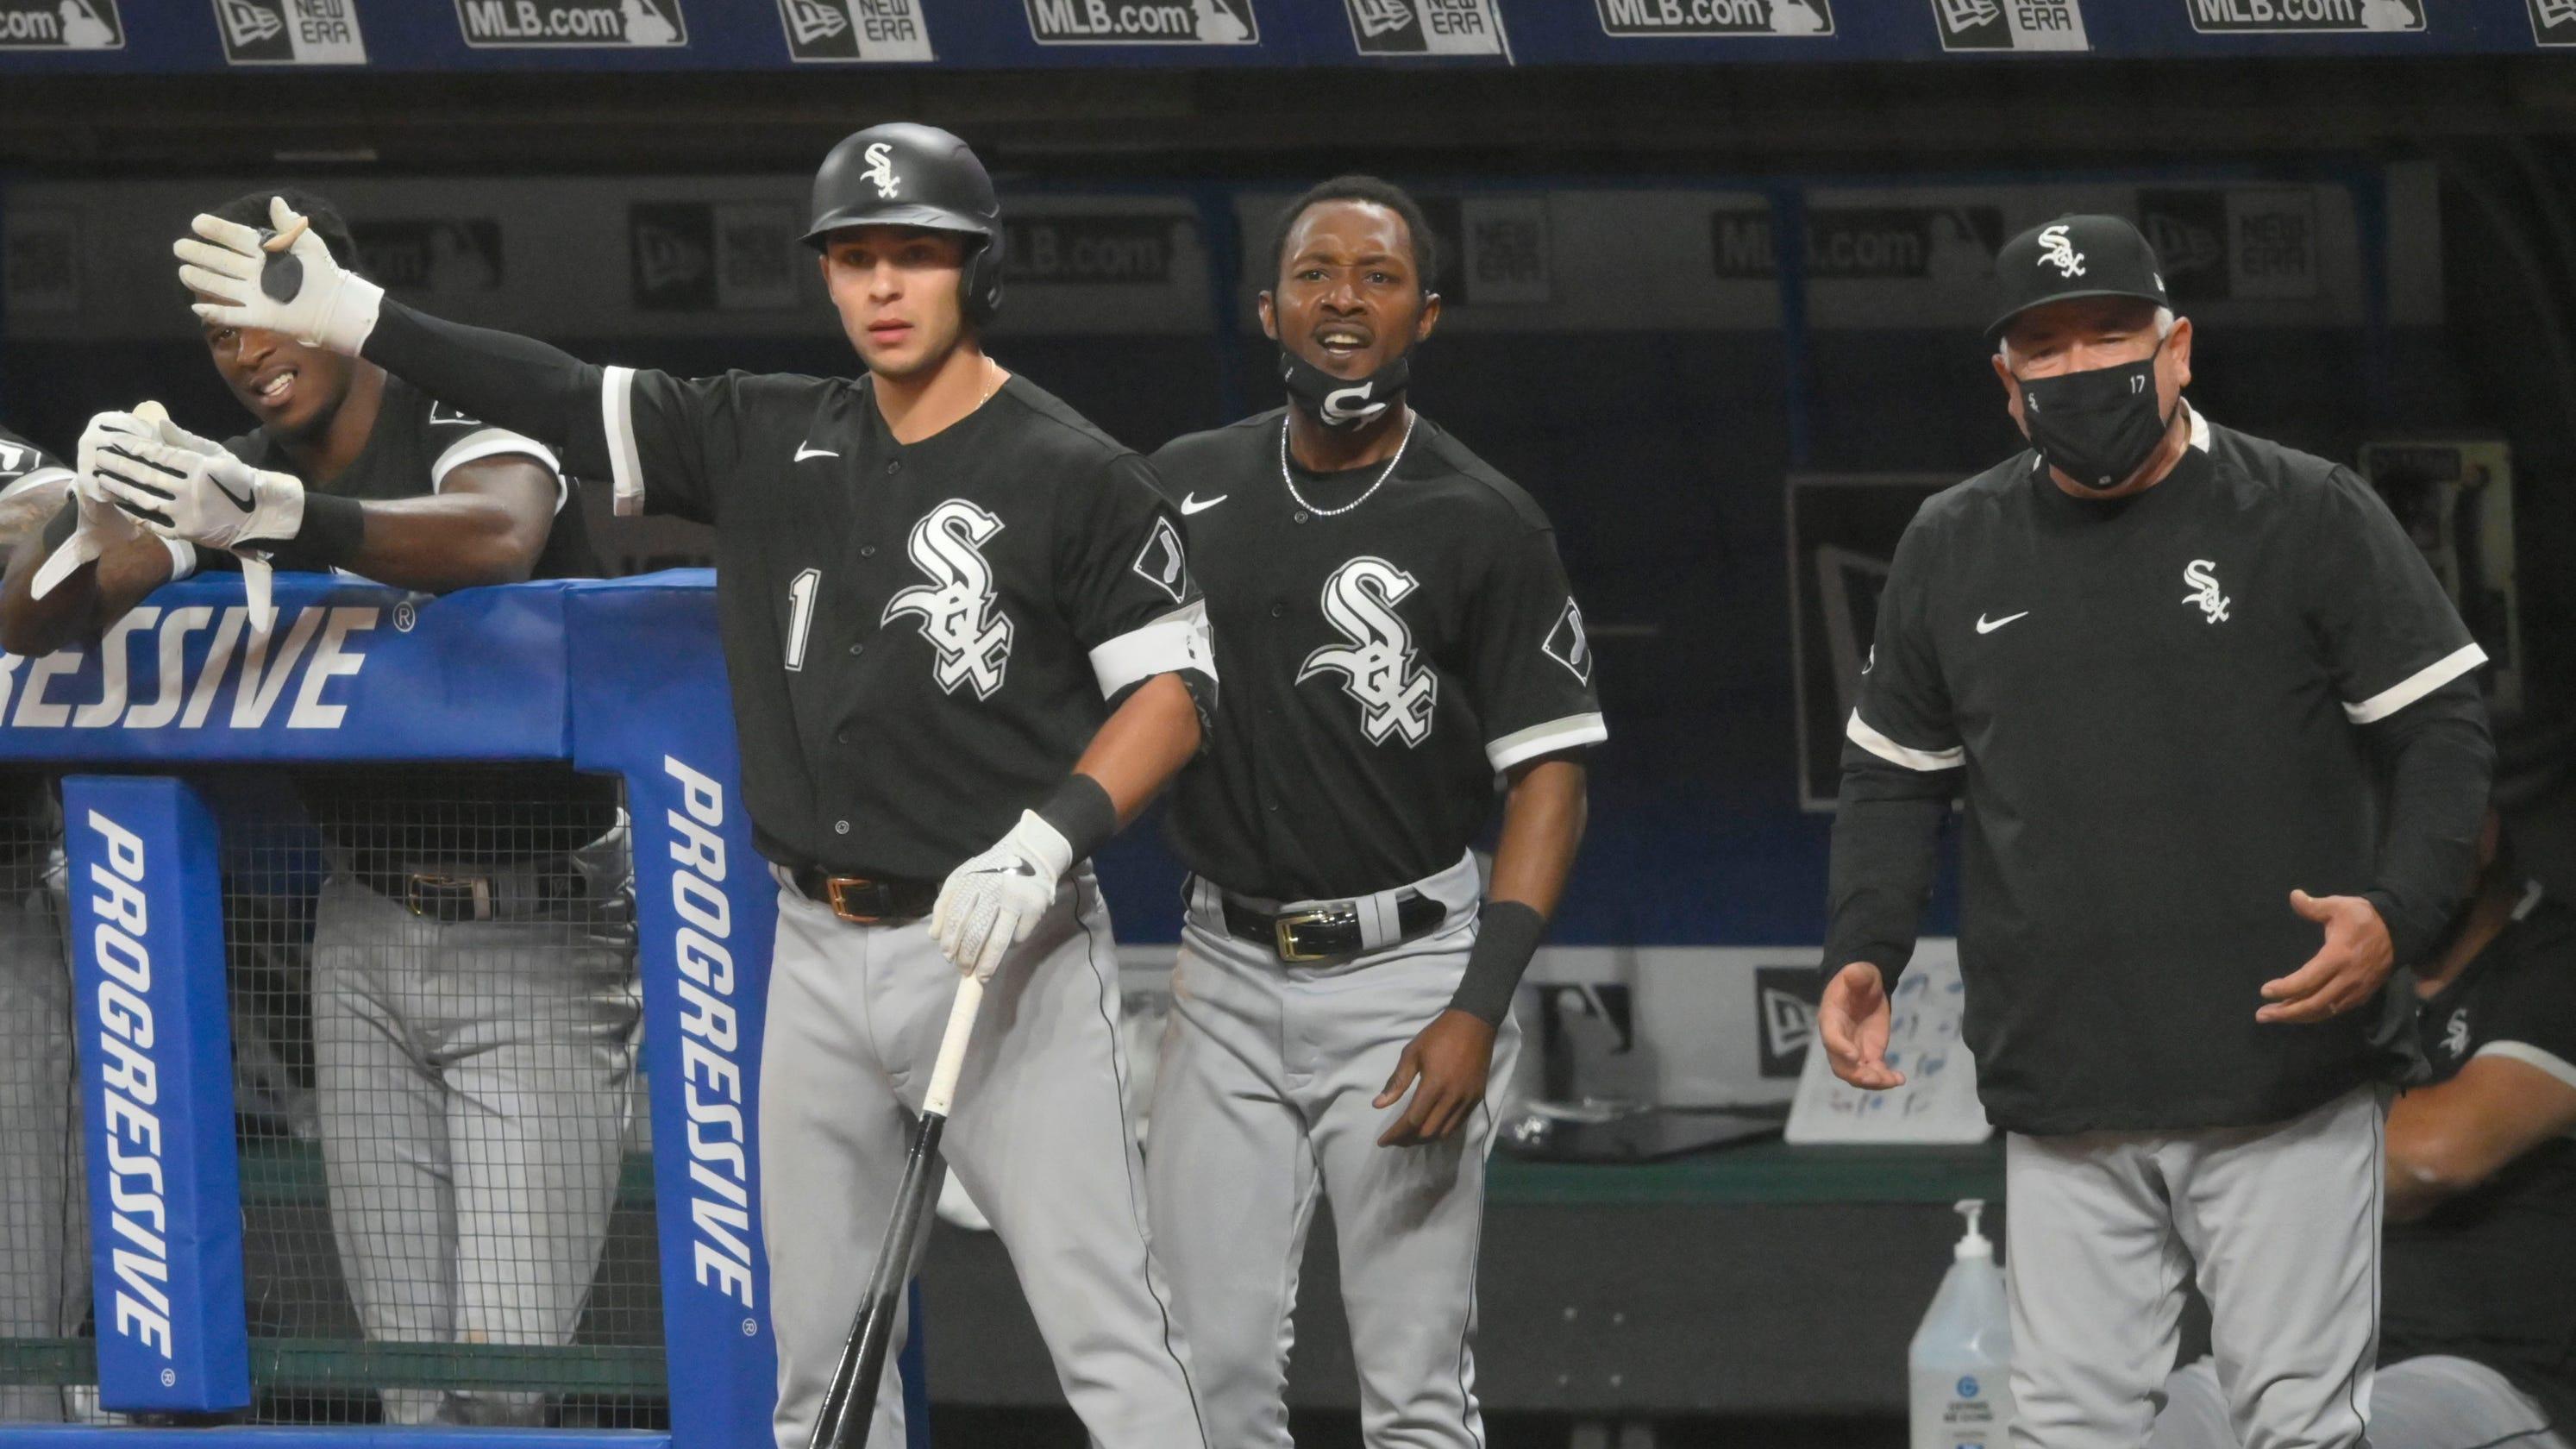 White Sox, Yankees among teams limping into postseason